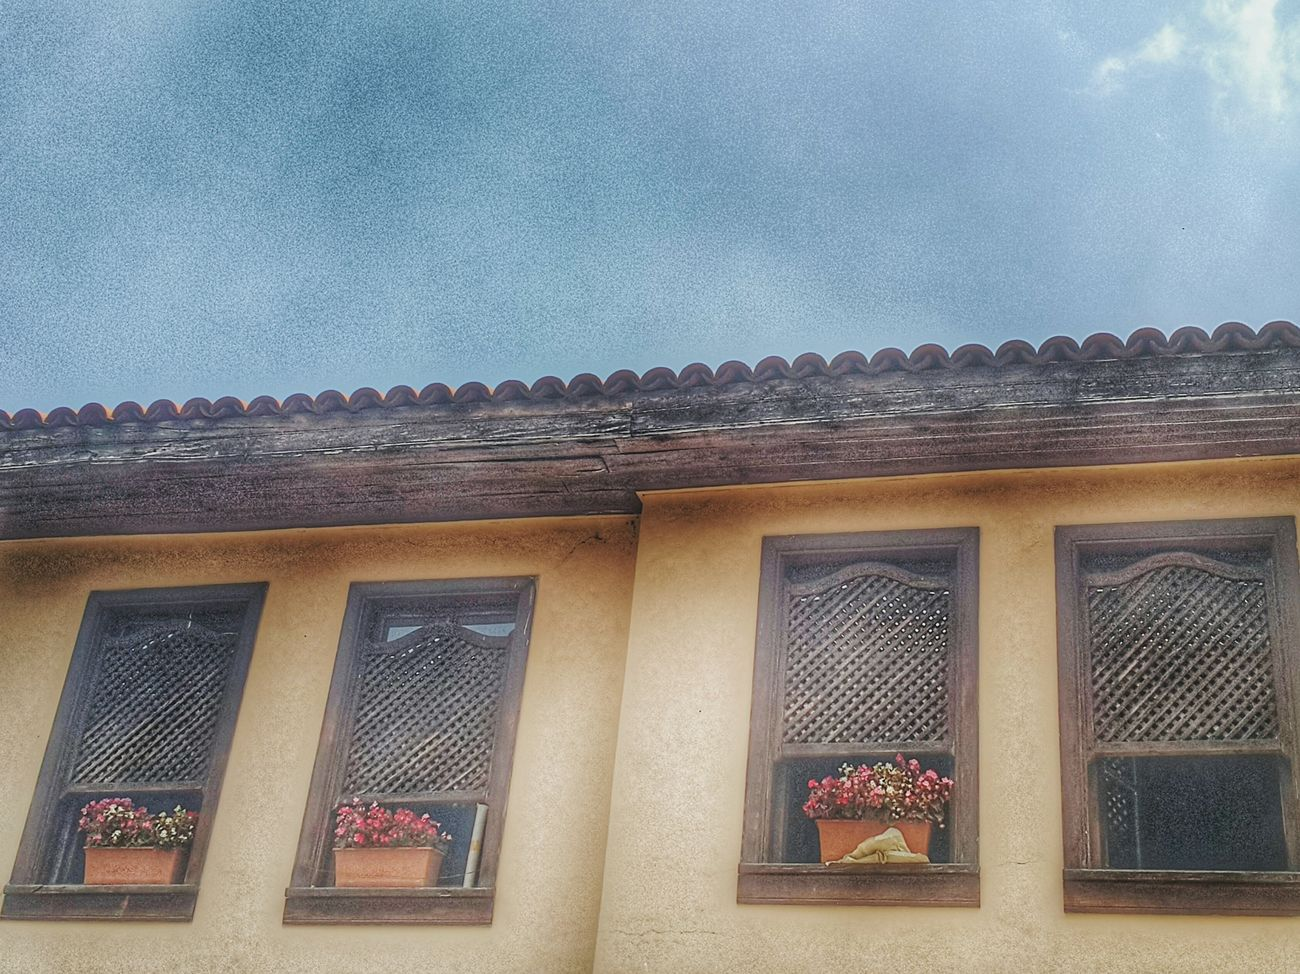 Pencere Flower Flowers Ahşap